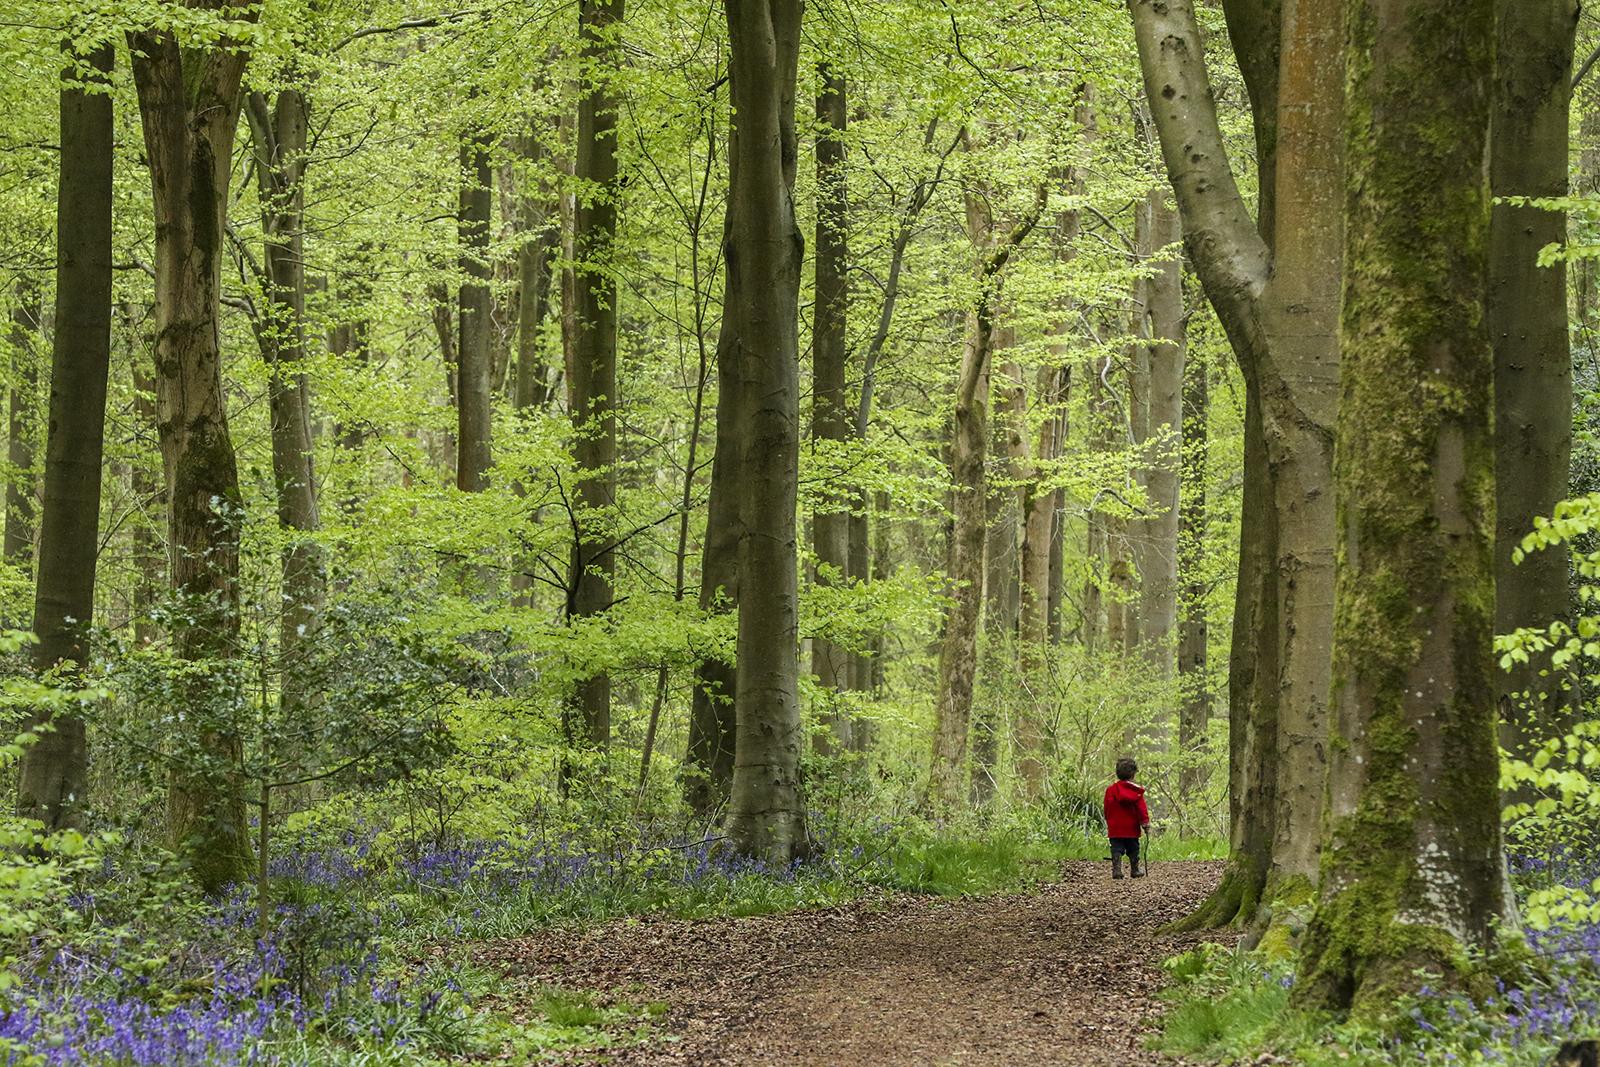 First 'Little man on a big walk' by Tony O'Reilly